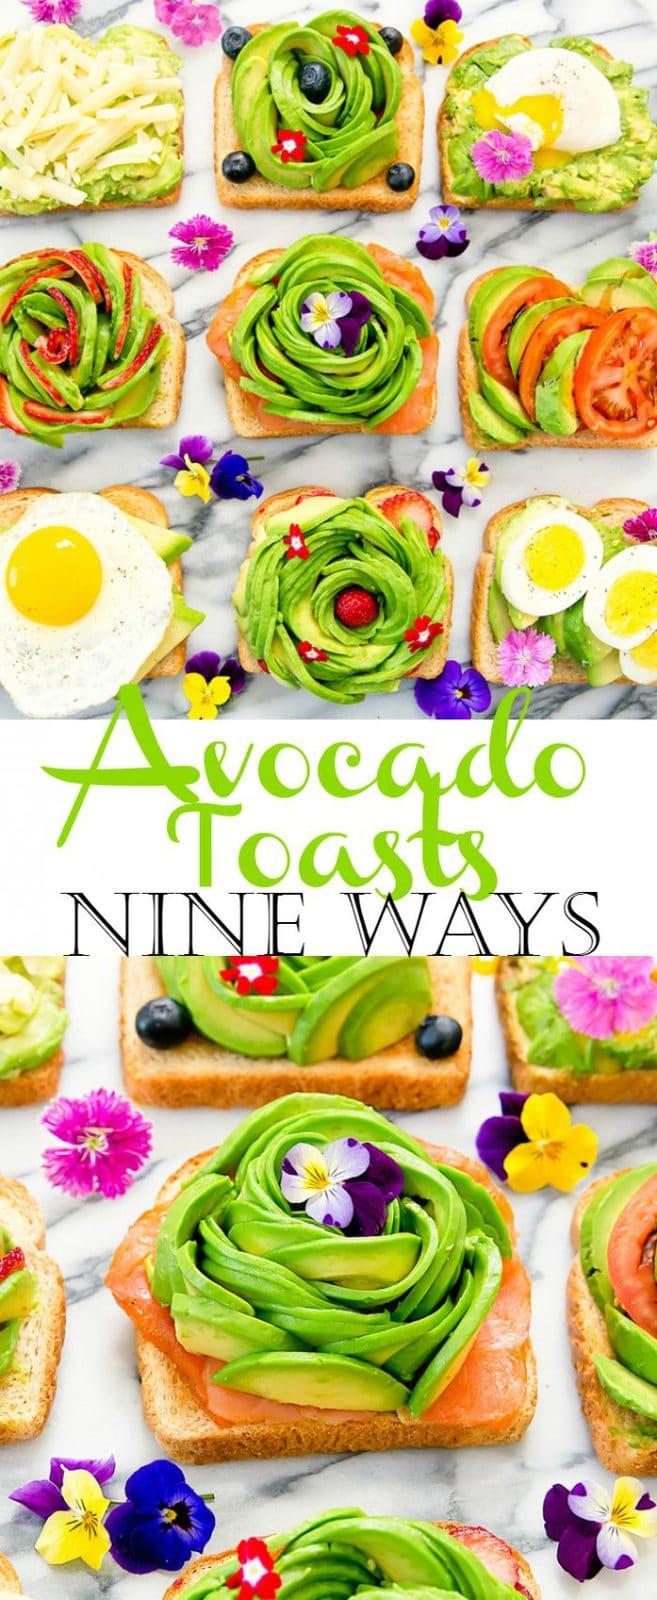 Avocado Roses and Toast Nine Ways